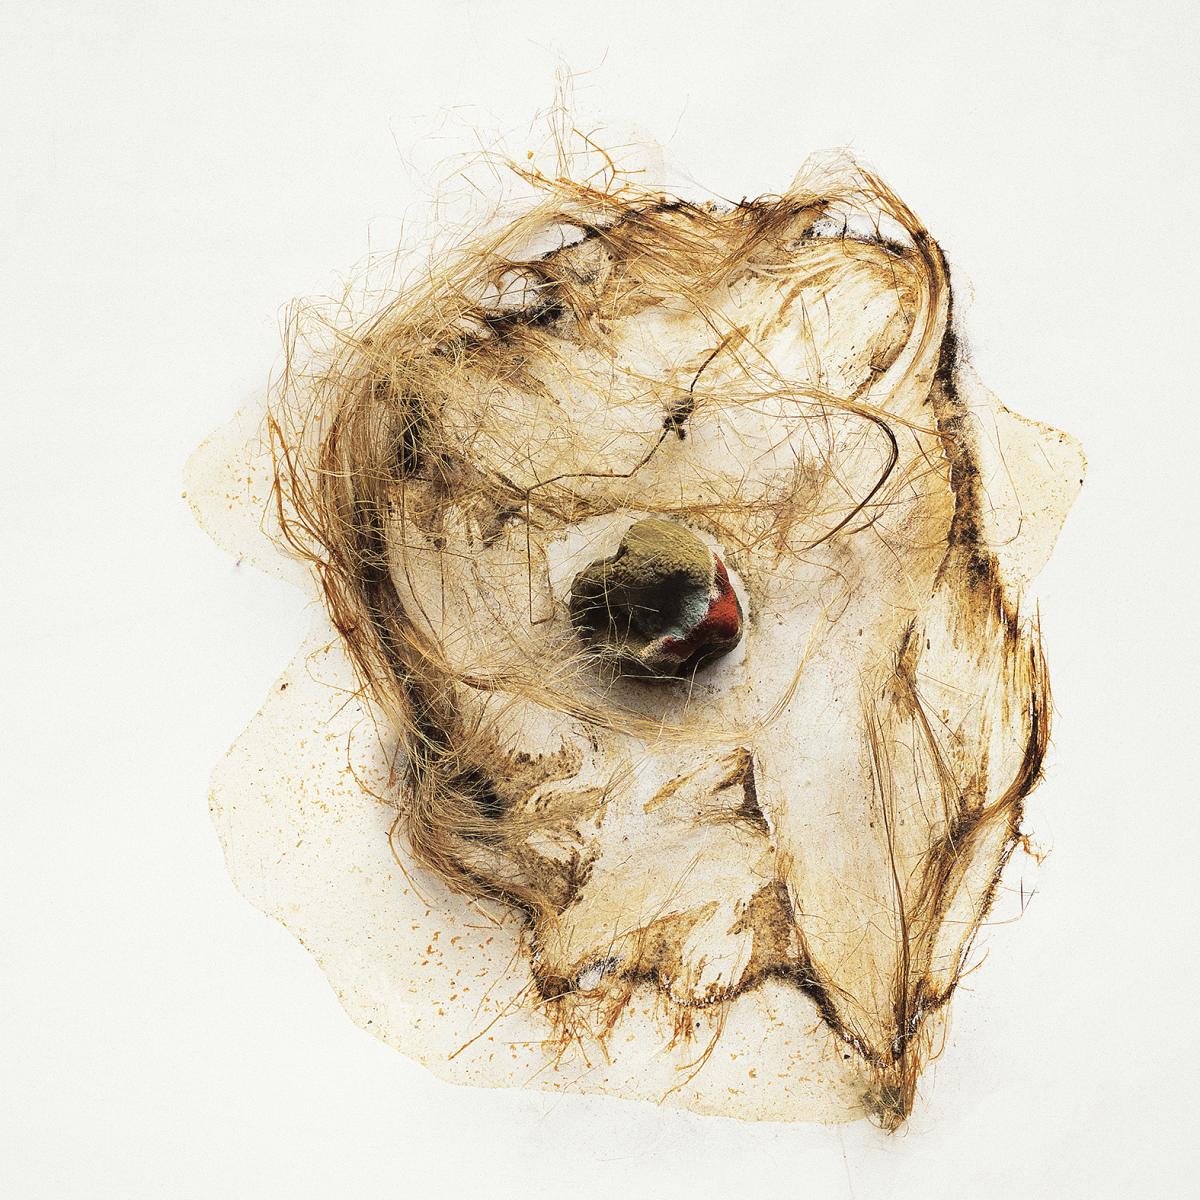 Filip Berendt, Pandemic V, 2009, photography archival print on dibond ed.62AP,50x 40 cm